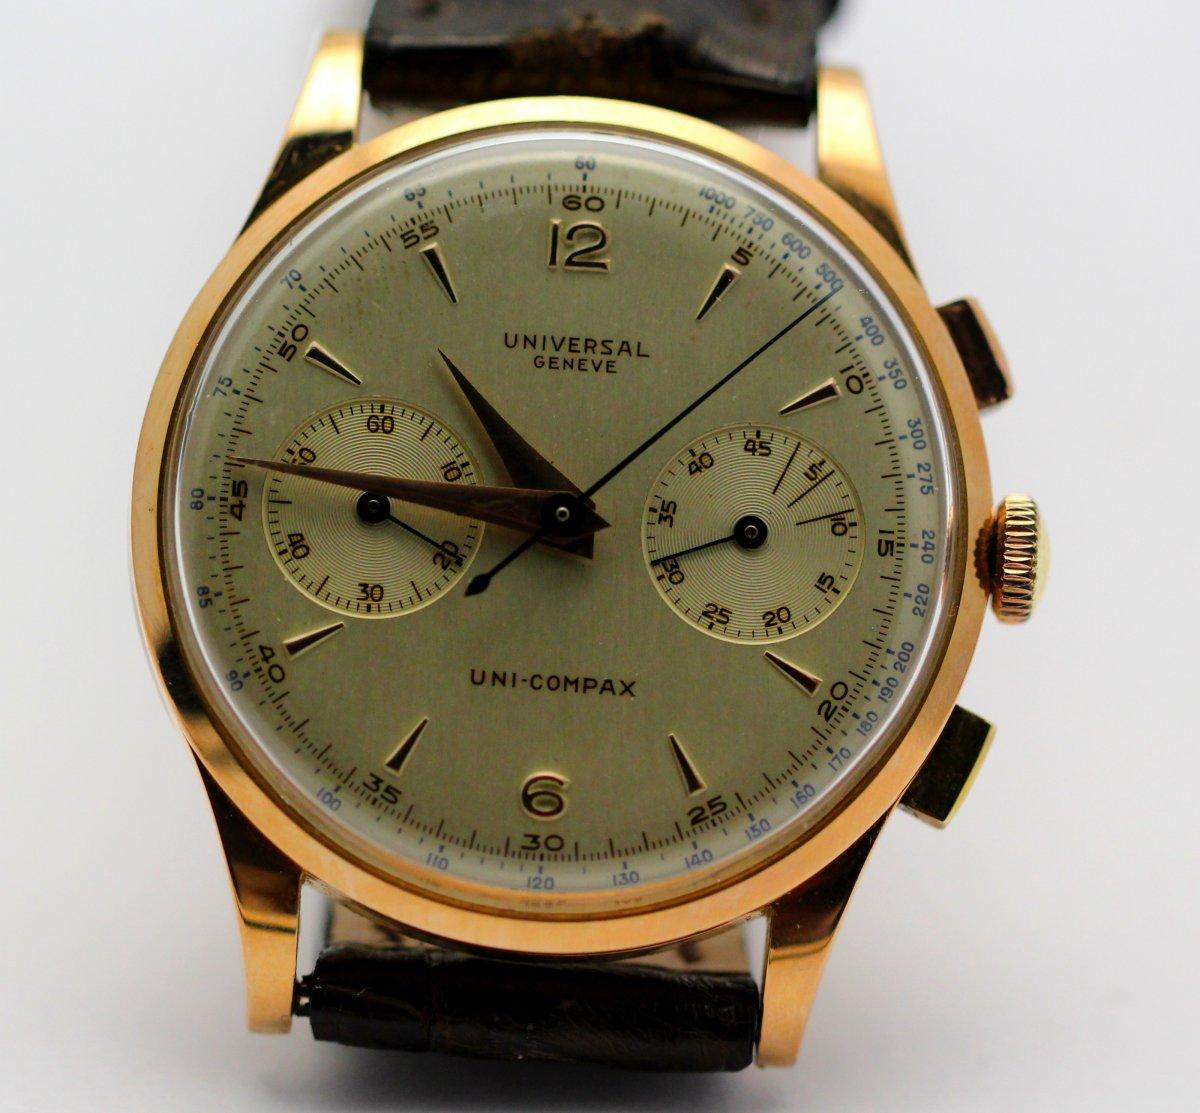 Universal Geneve Bracelet Watch